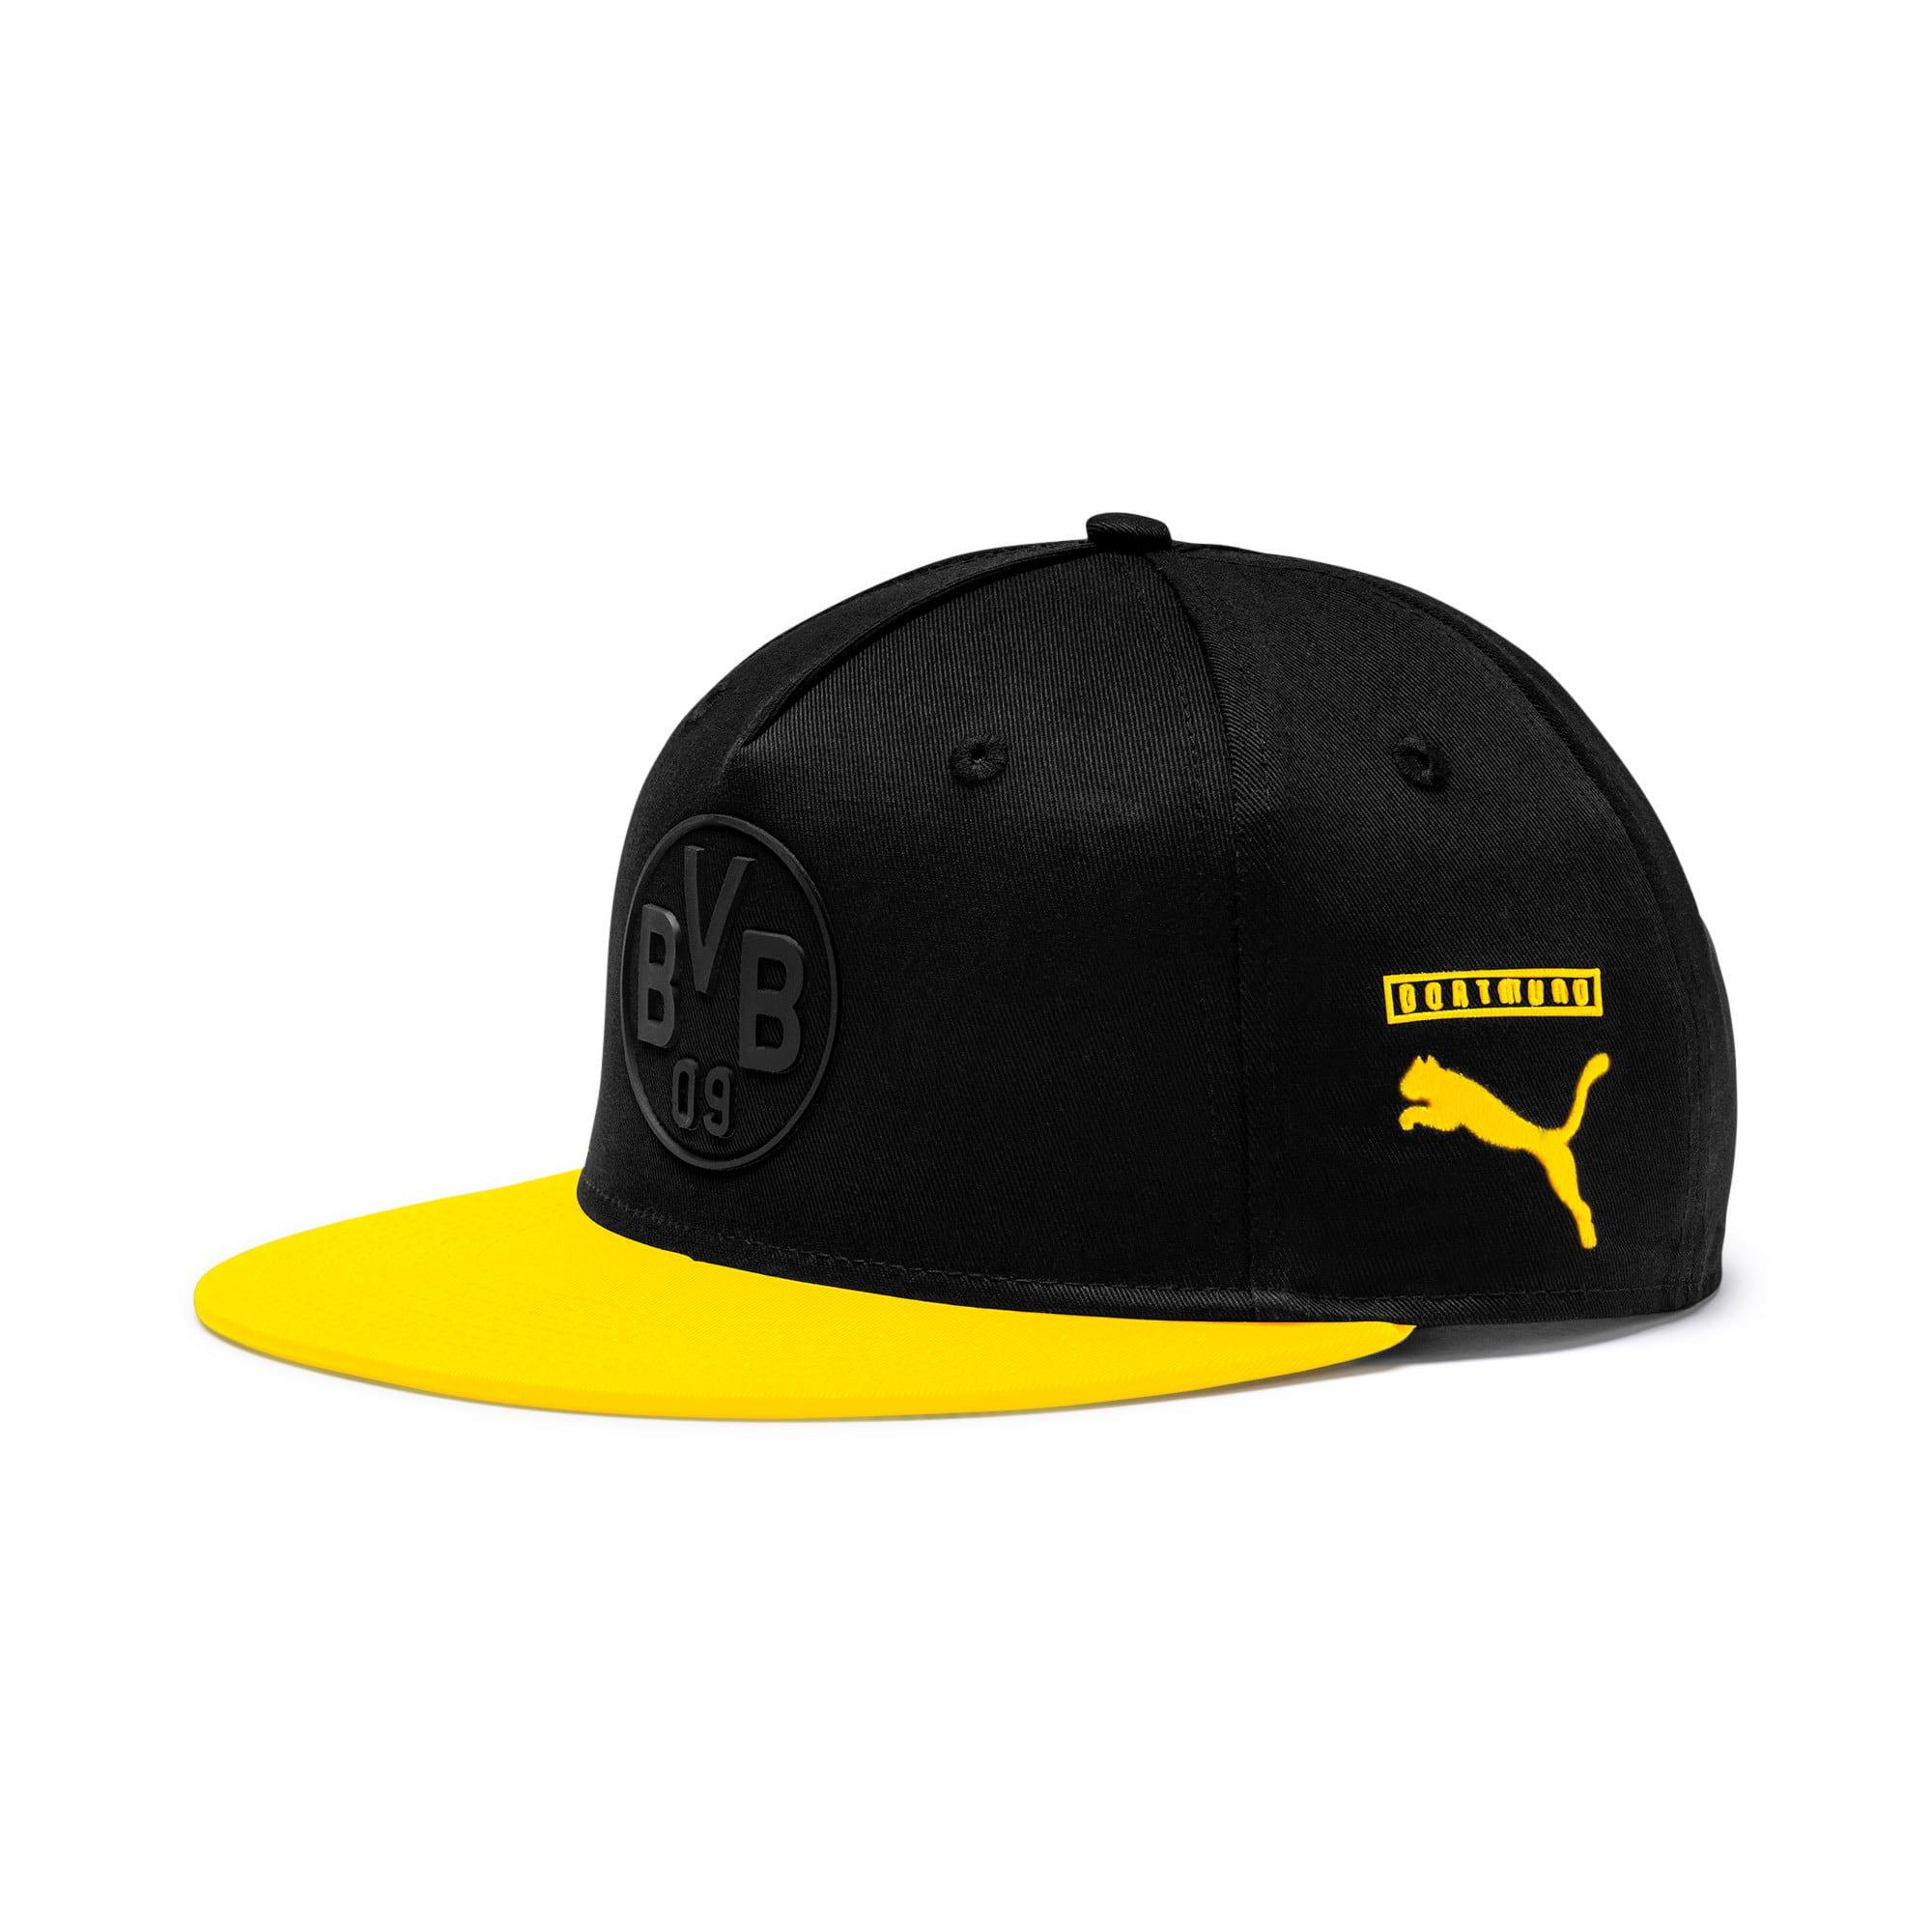 Thumbnail 1 of BVB flatbrim Fan Cap, Puma Black-Cyber Yellow, medium